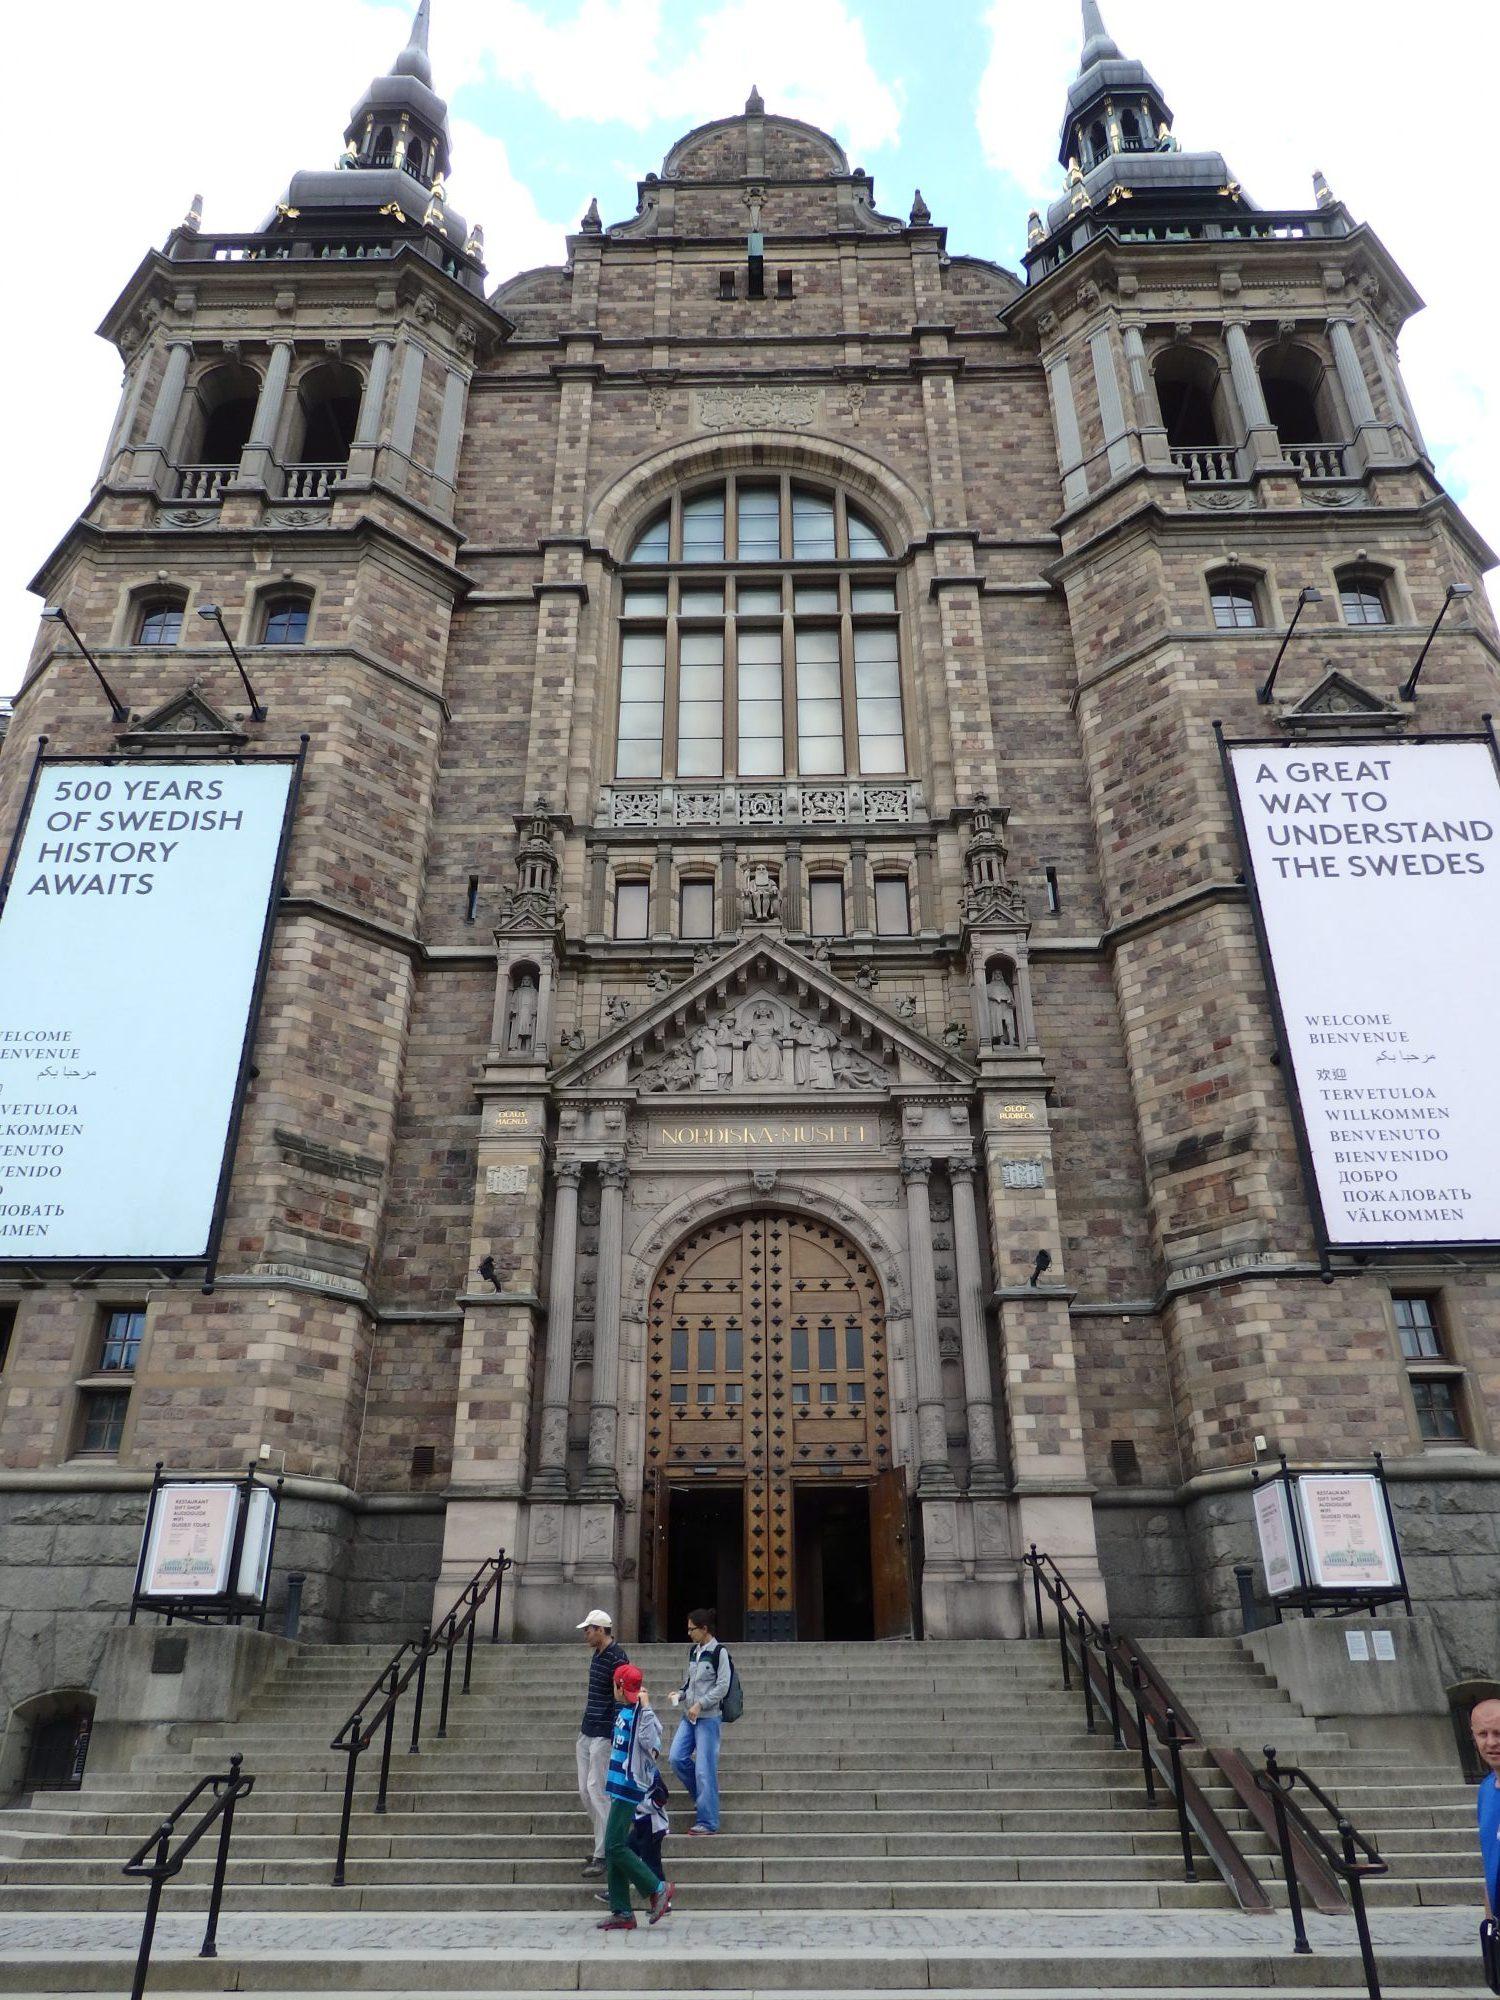 The Nordic Museum in Sweden, Scotland